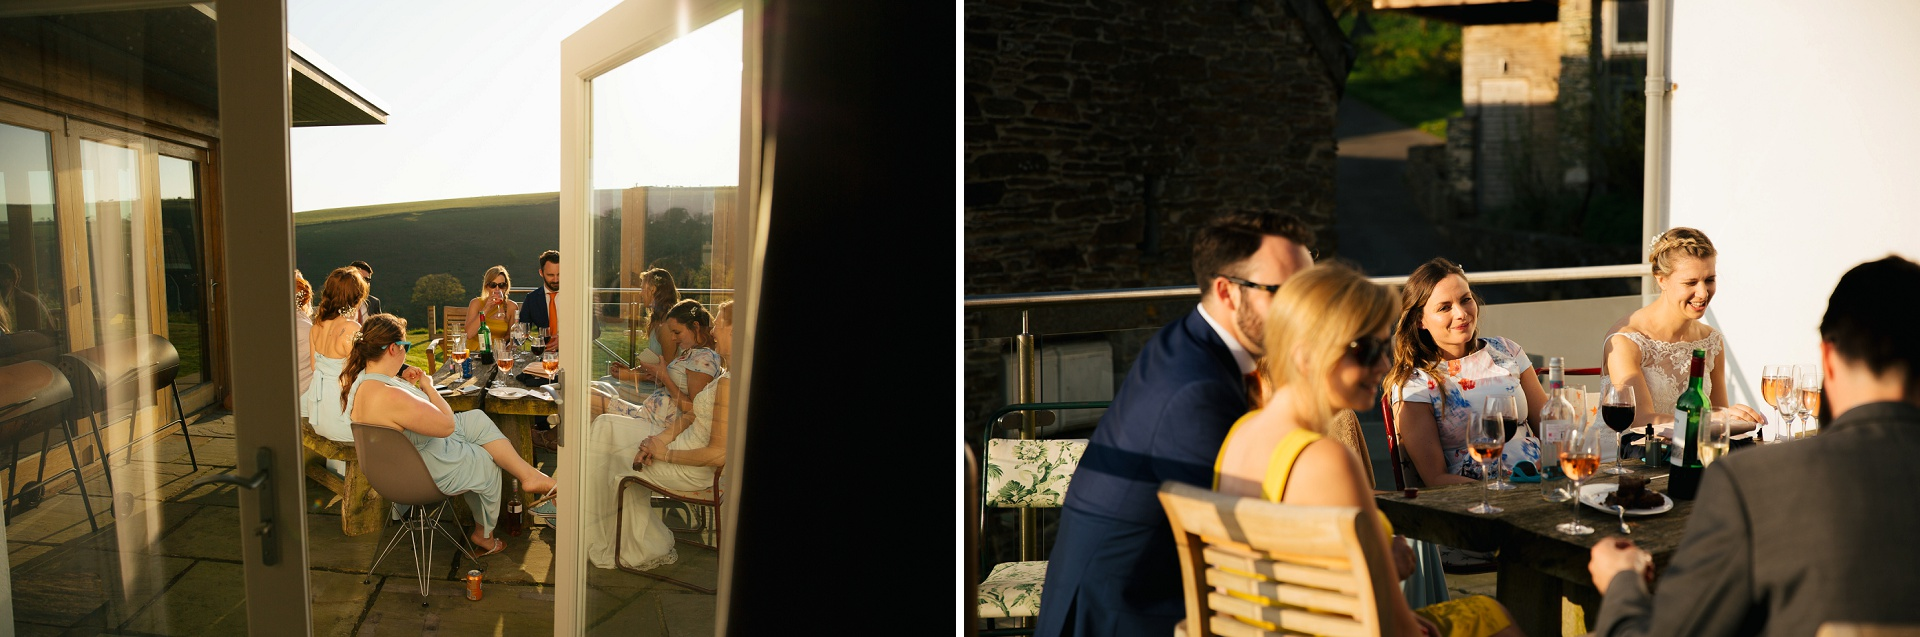 Tregulland wedding photography